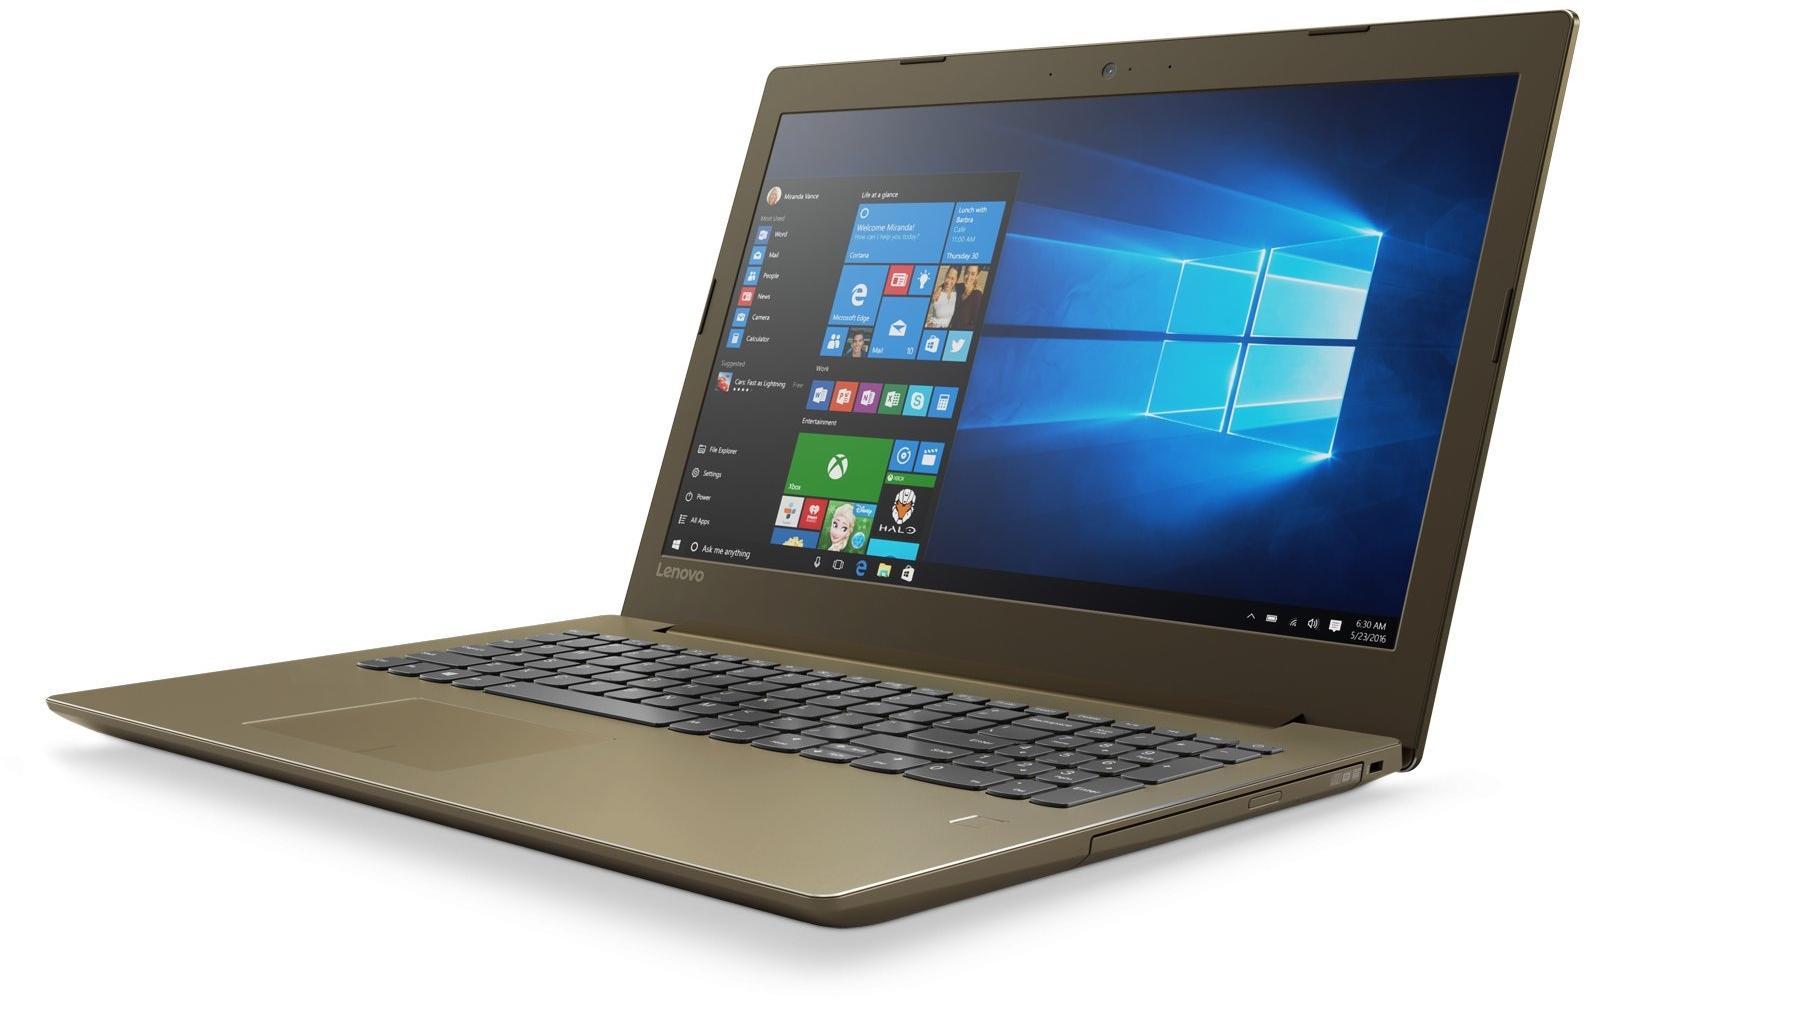 Купить Ноутбук Lenovo IdeaPad 520S-14IKBR (81BL0094RU) фото 2